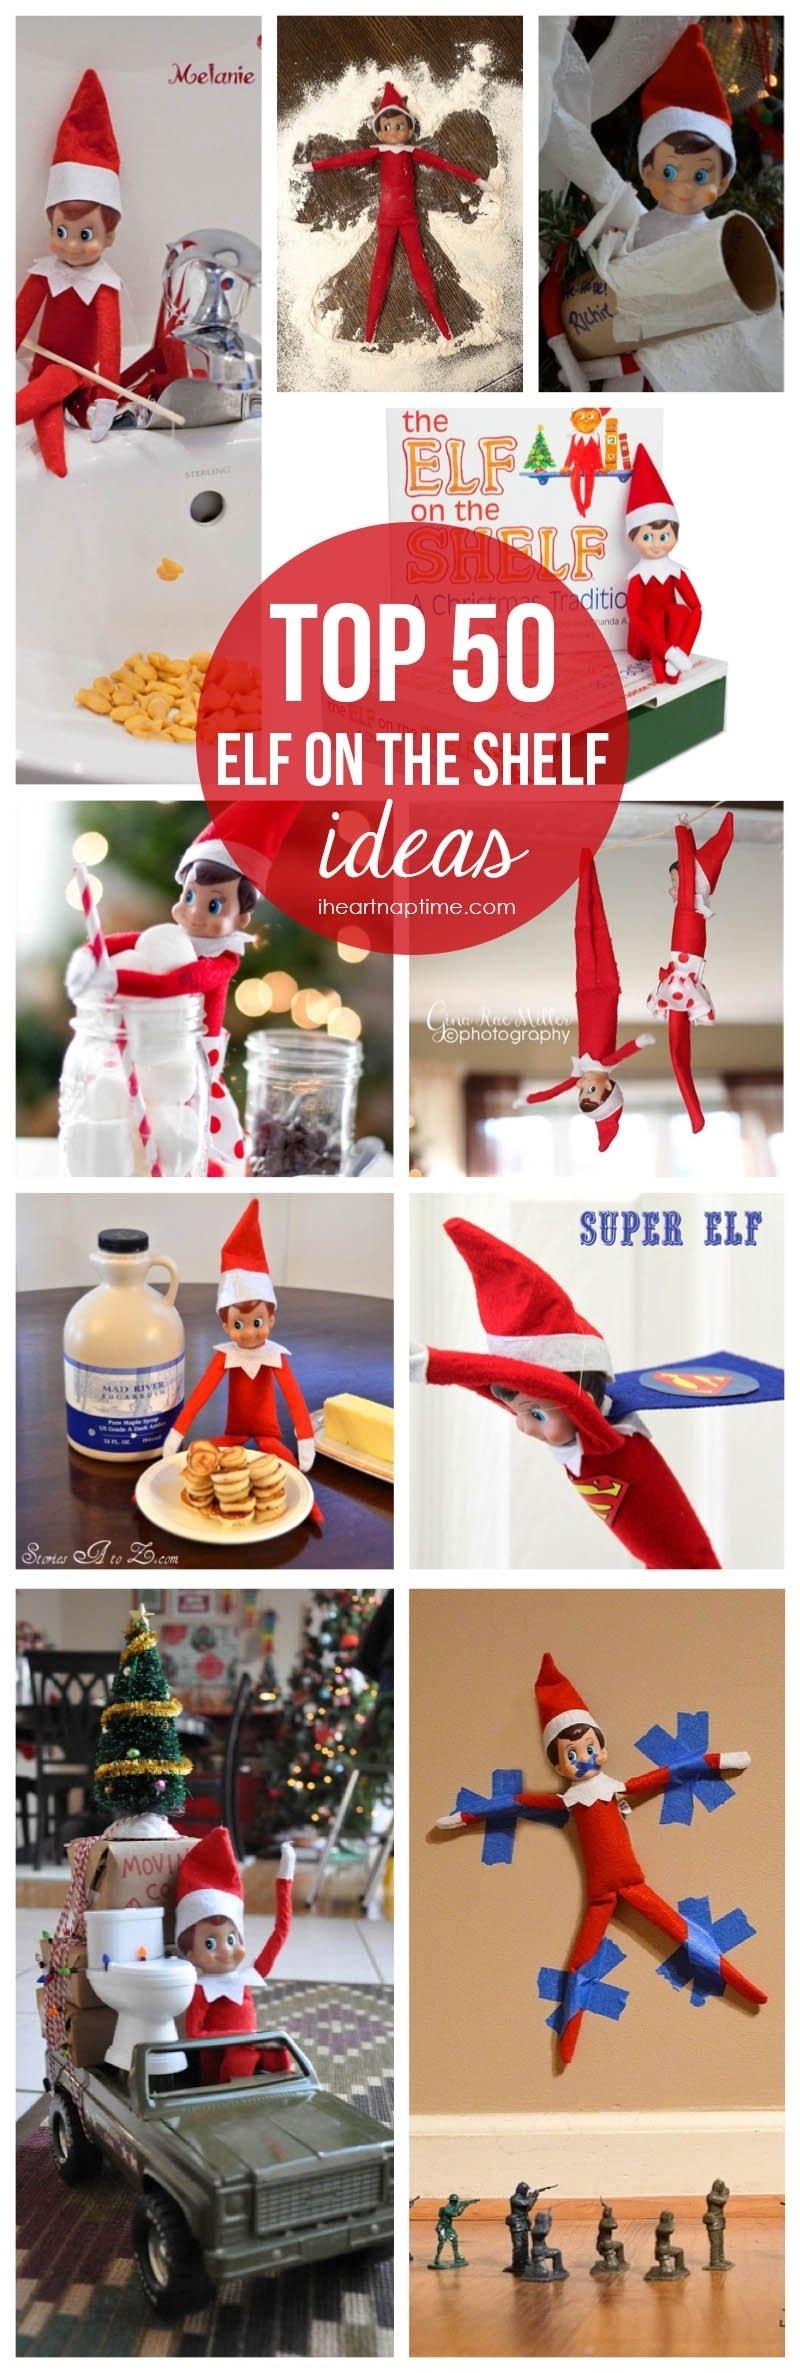 10 Stunning Elf On The Shelf Creative Ideas top 50 elf on the shelf ideas i heart nap time 4 2020